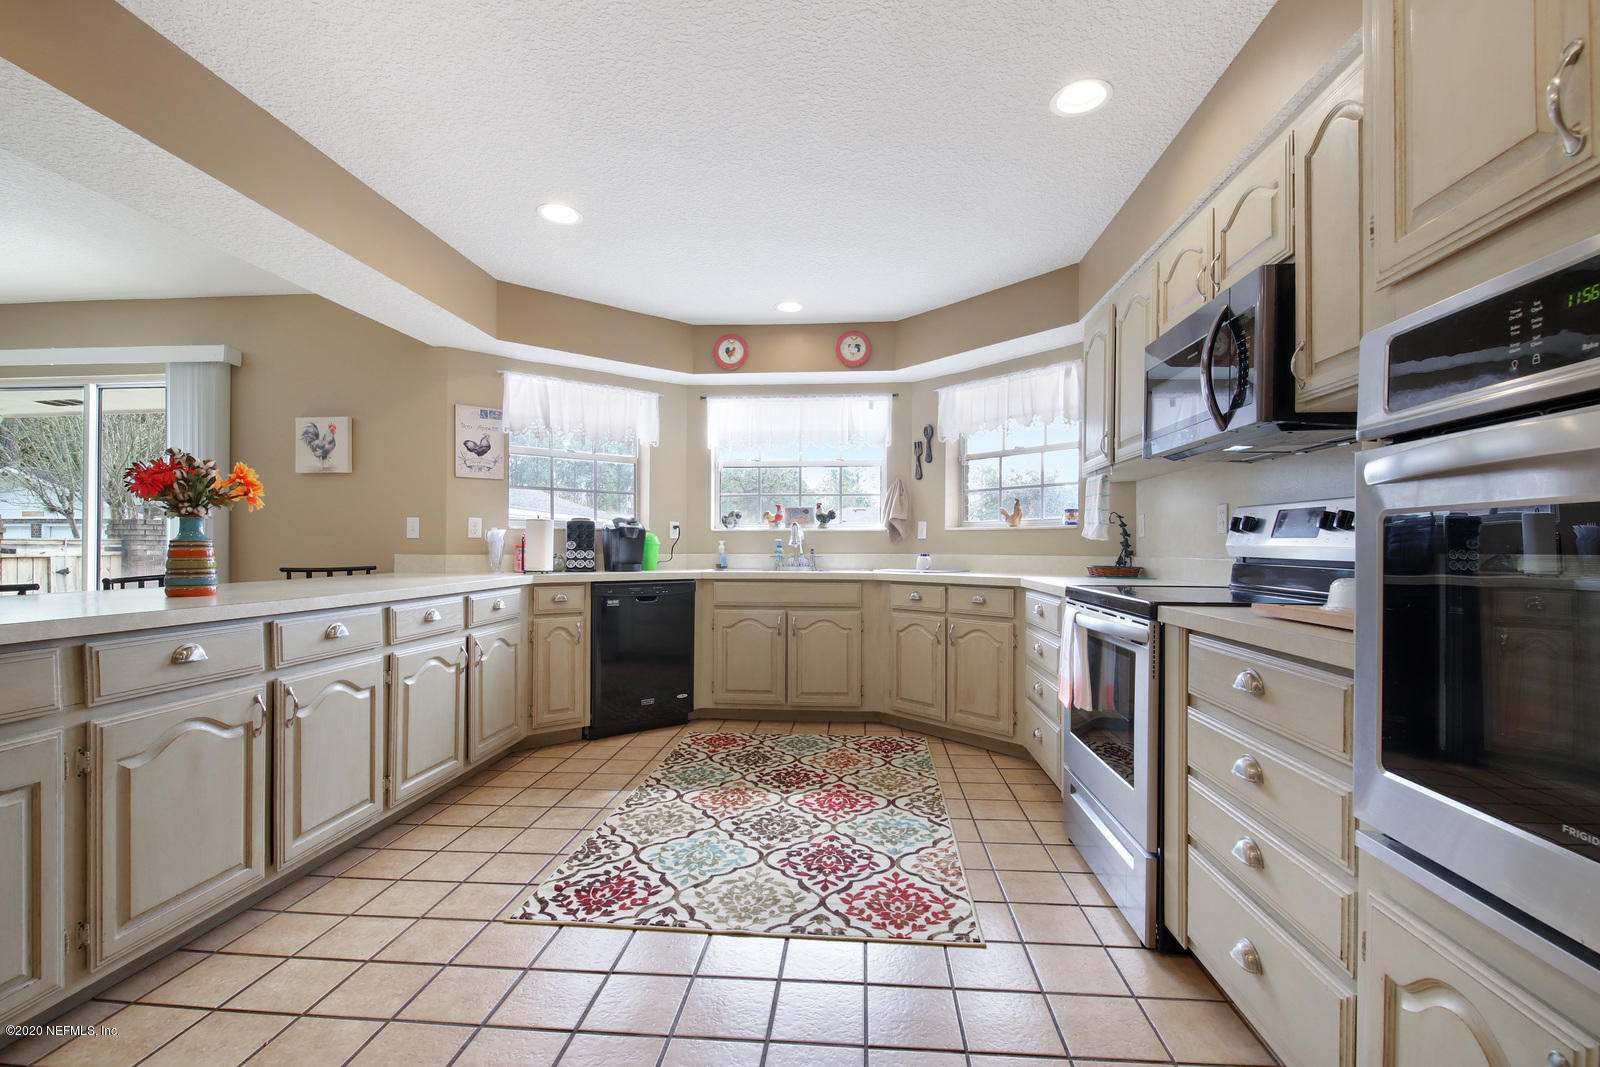 510 MINNESOTA, MACCLENNY, FLORIDA 32063, 4 Bedrooms Bedrooms, ,3 BathroomsBathrooms,Residential,For sale,MINNESOTA,1062071